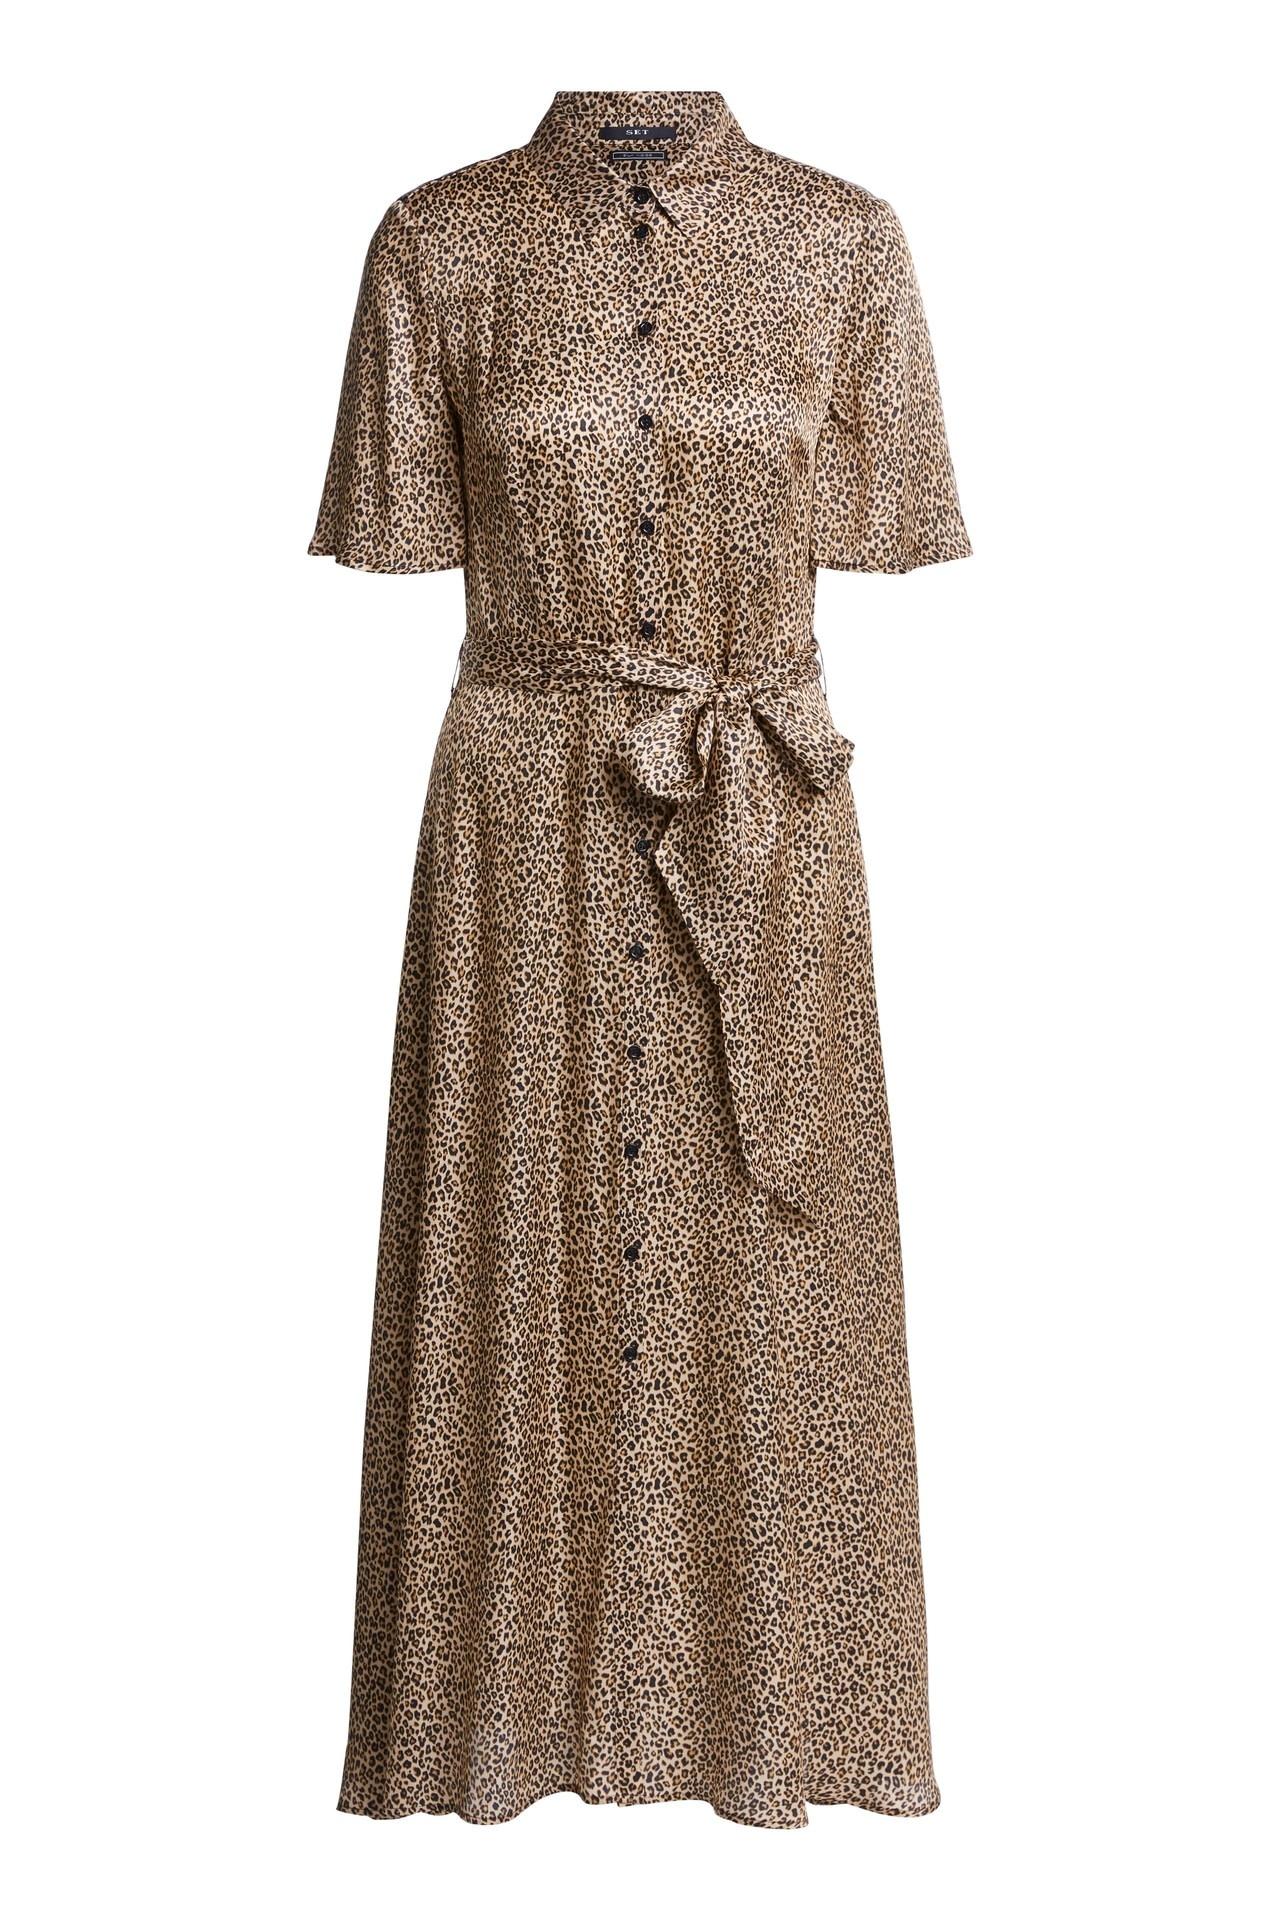 Long dress-1